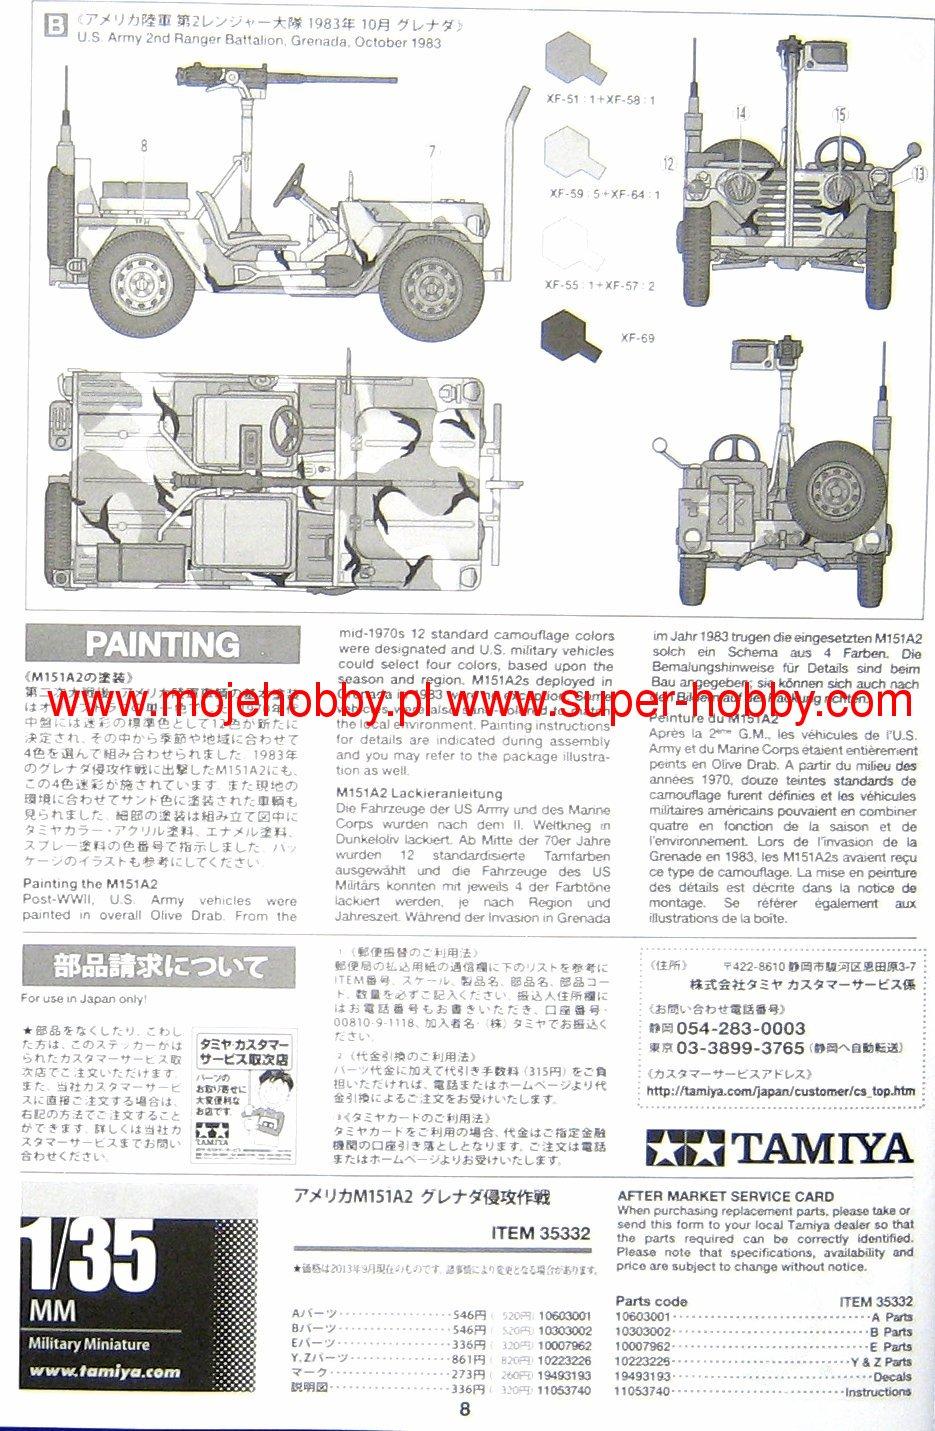 American Utility Truck M151A2 (Grenada 1983) model do